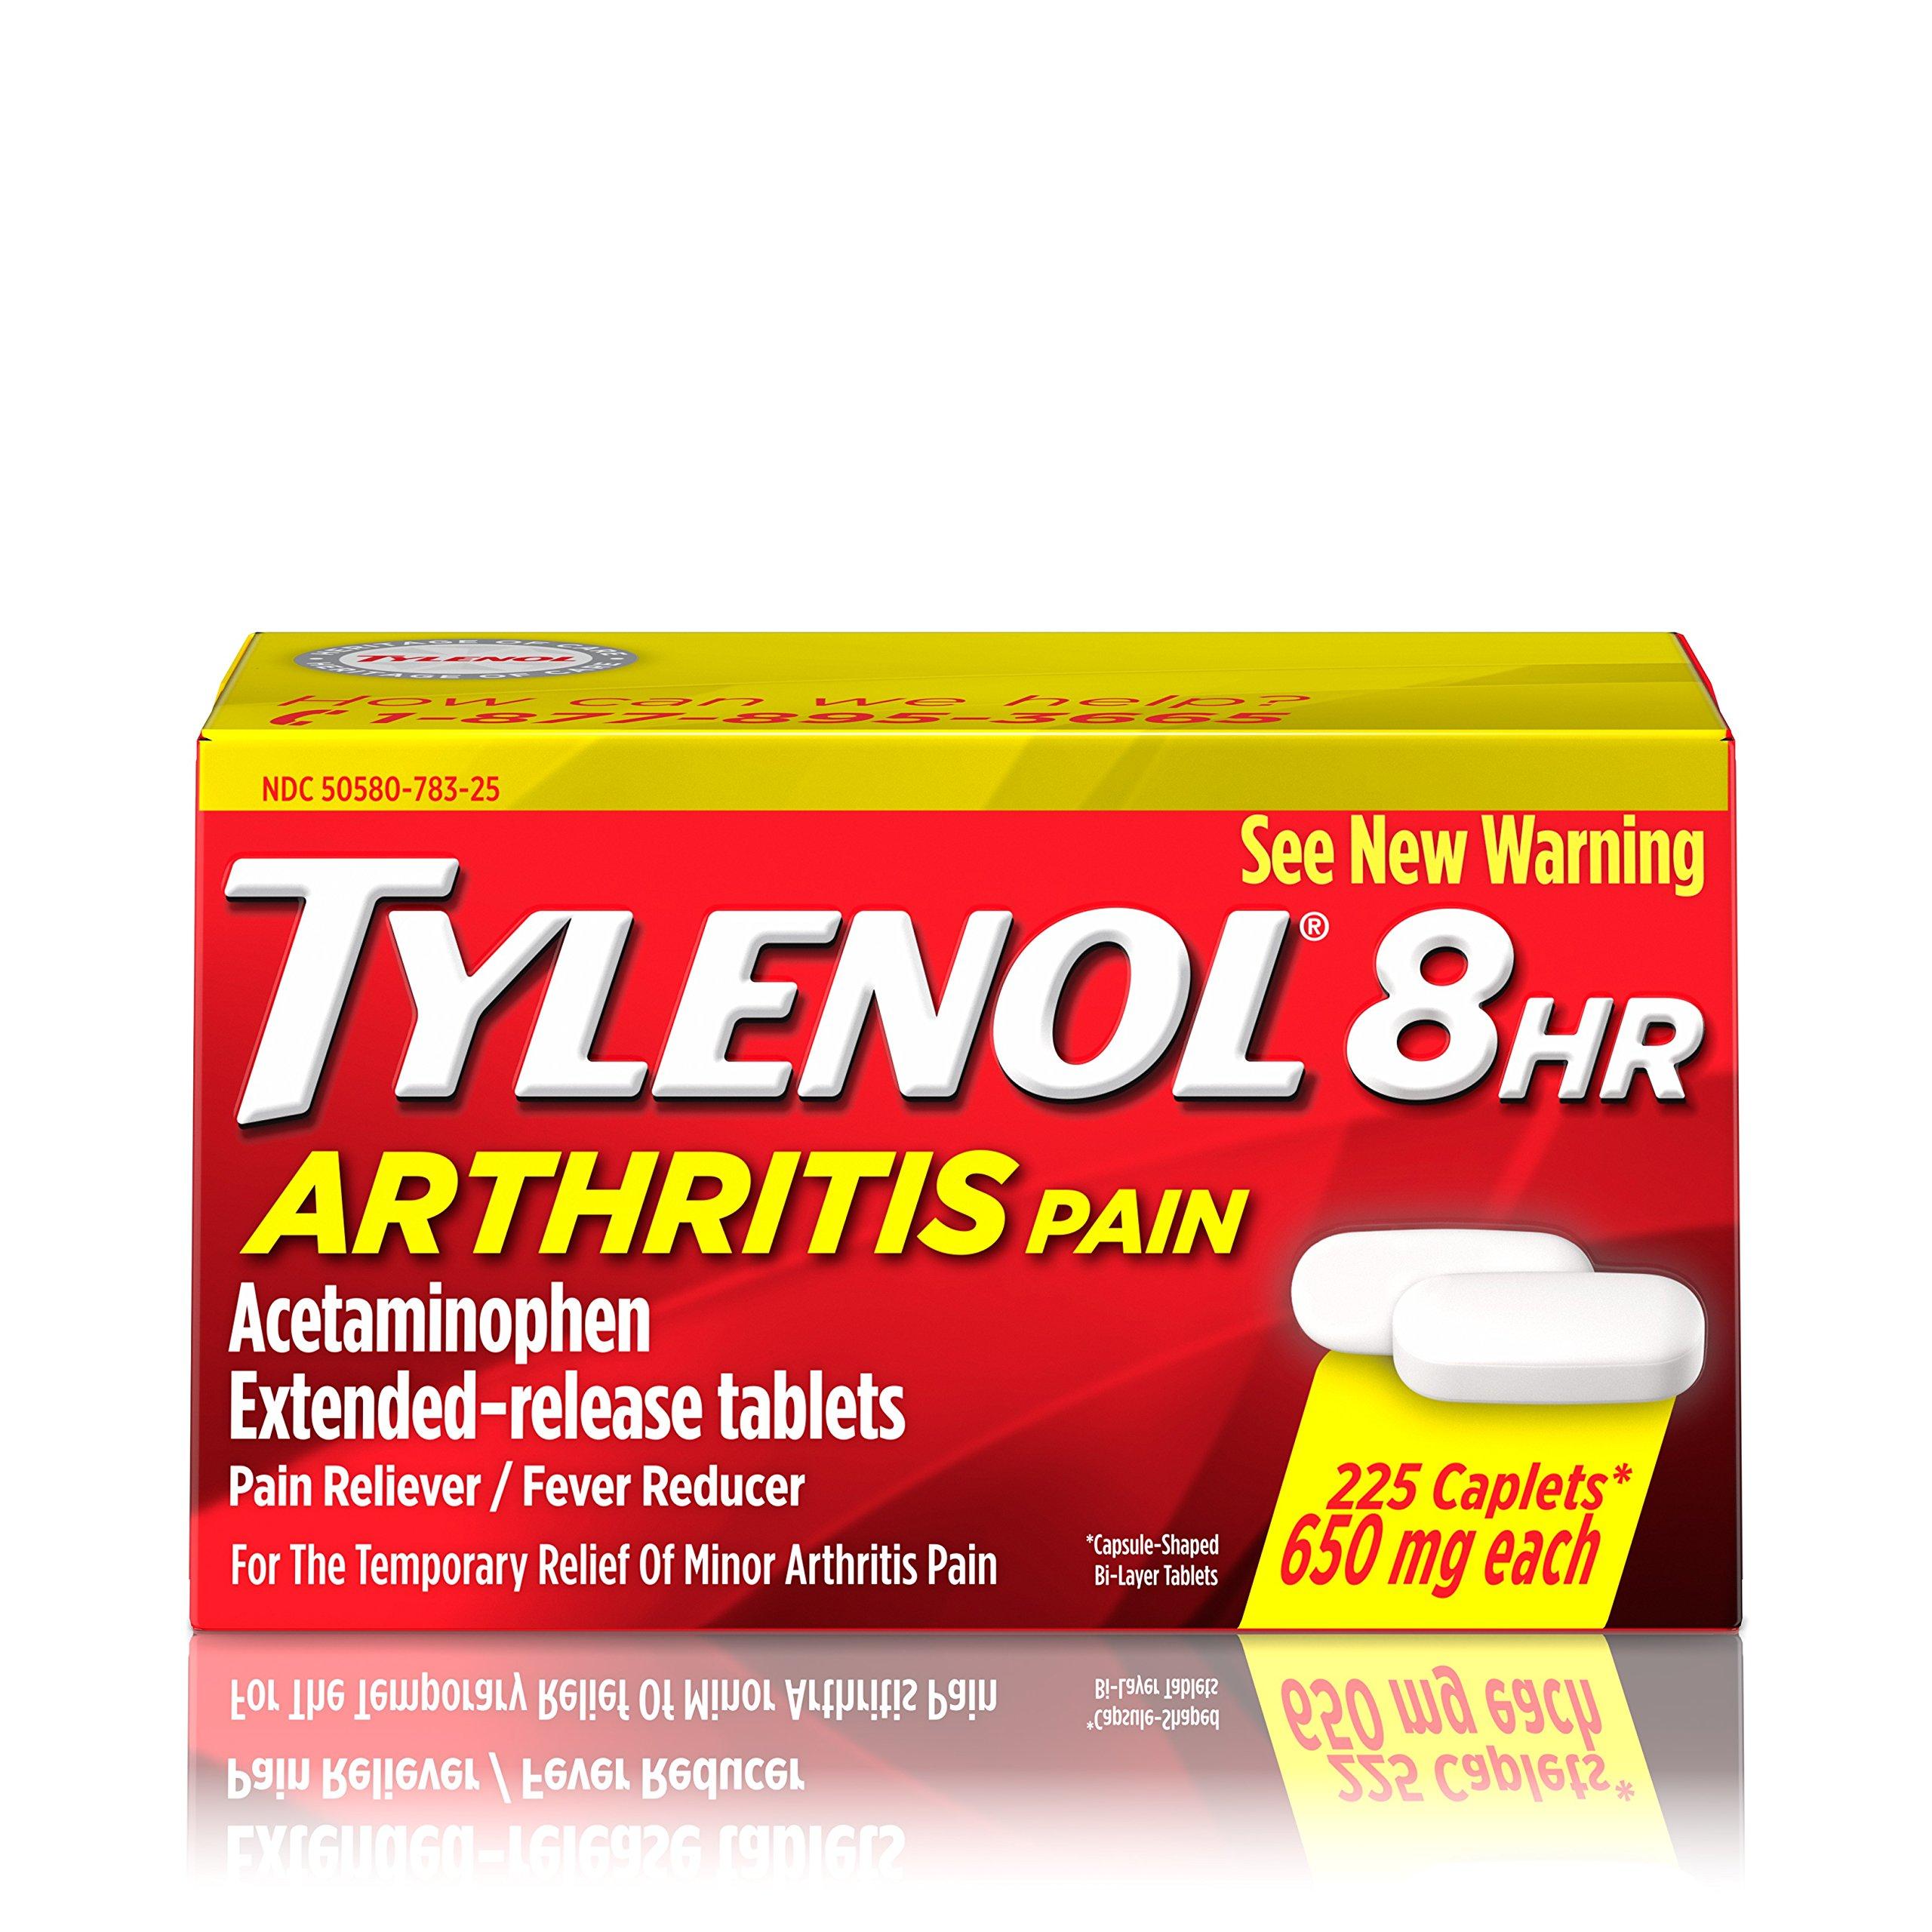 Tylenol 8 HR Arthritis Pain Extended Release Caplets, 650 Mg, 225 Count